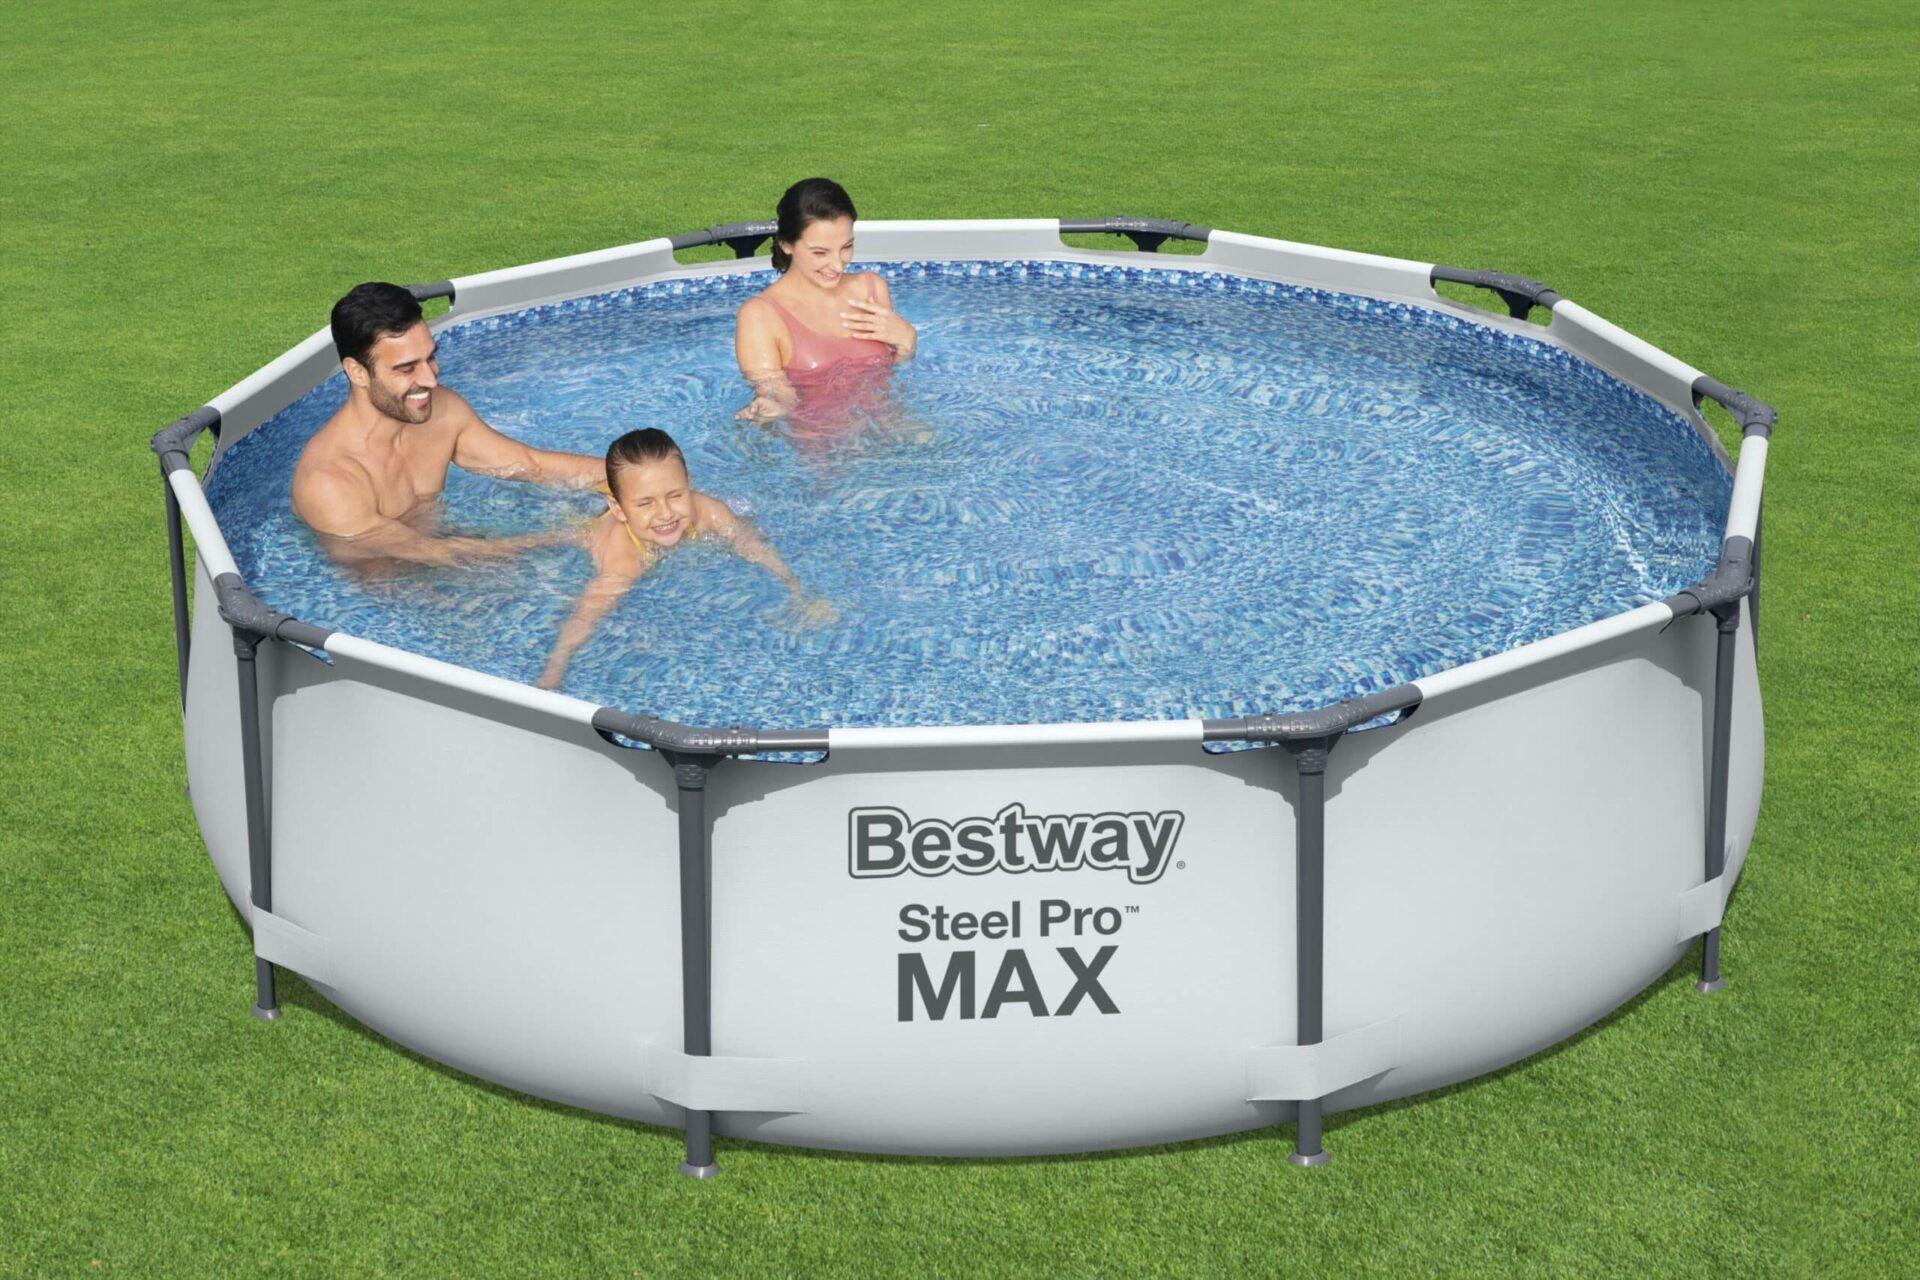 Rundt Steel Pro MAX bassengsett svømmebasseng barn